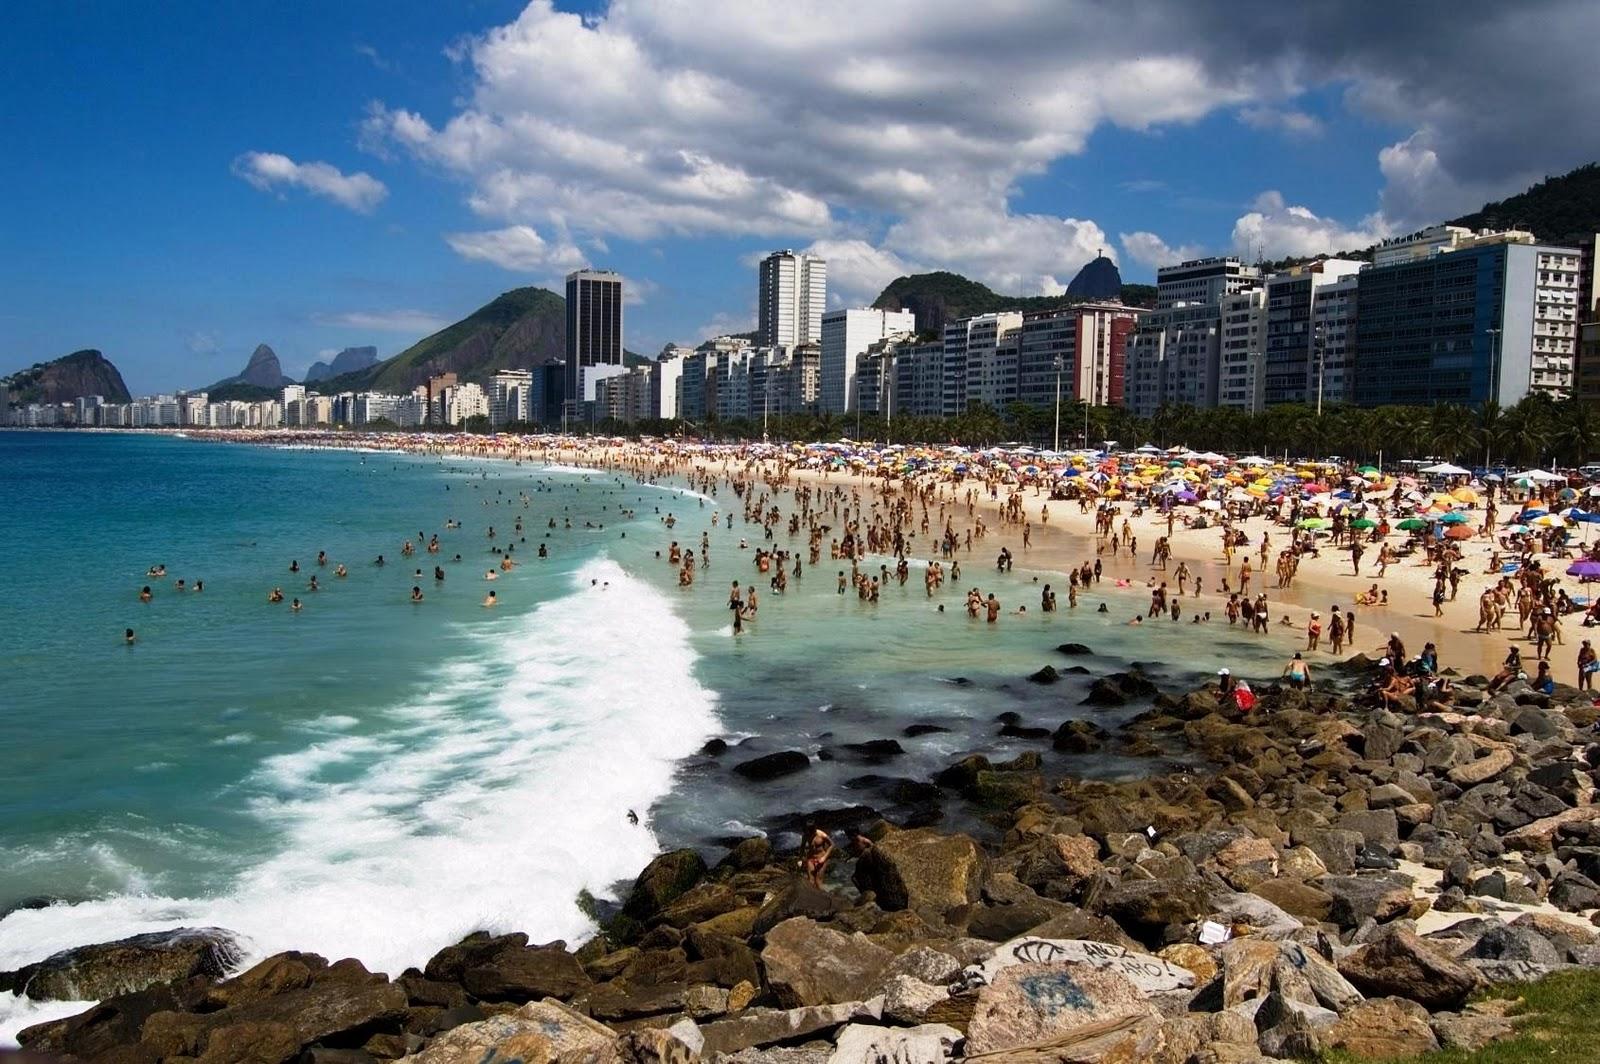 Praia de Ipanema - Rio de Janeiro RJ | Places to Visit | Pinterest ...